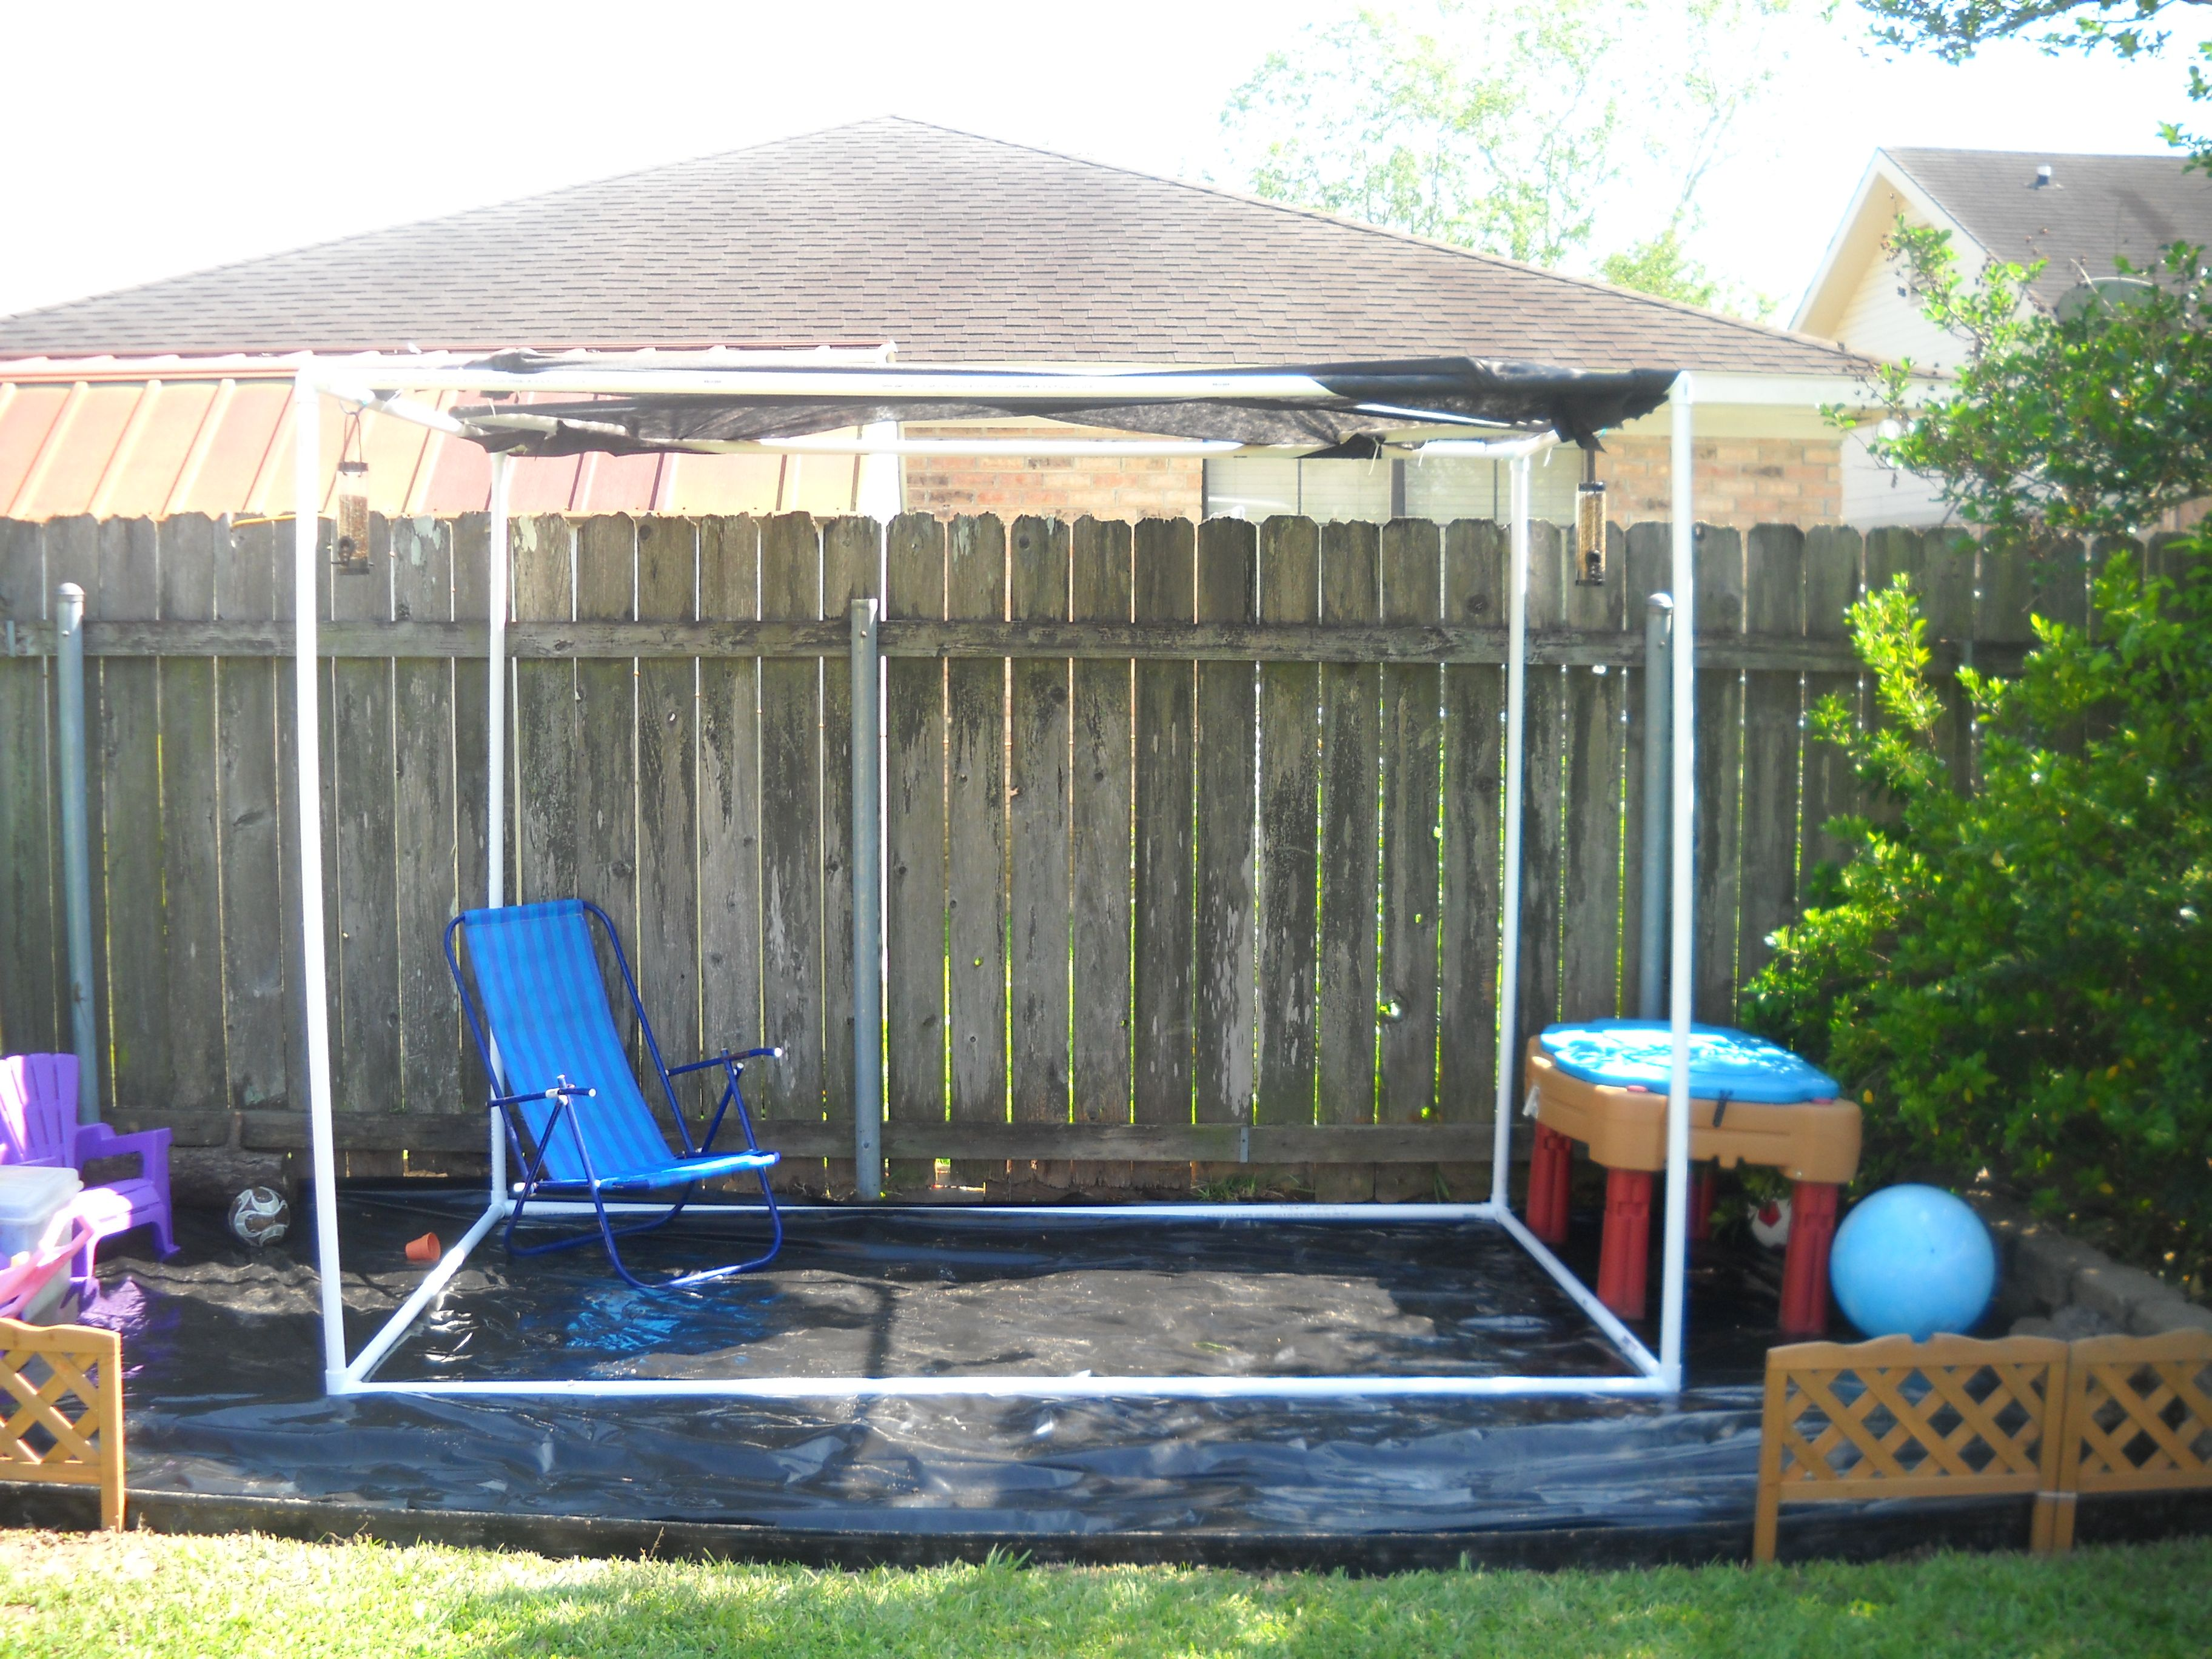 Pin By Carmonthegreat Simon On Great Yard Ideas Outdoor Shade Diy Shades Backyard